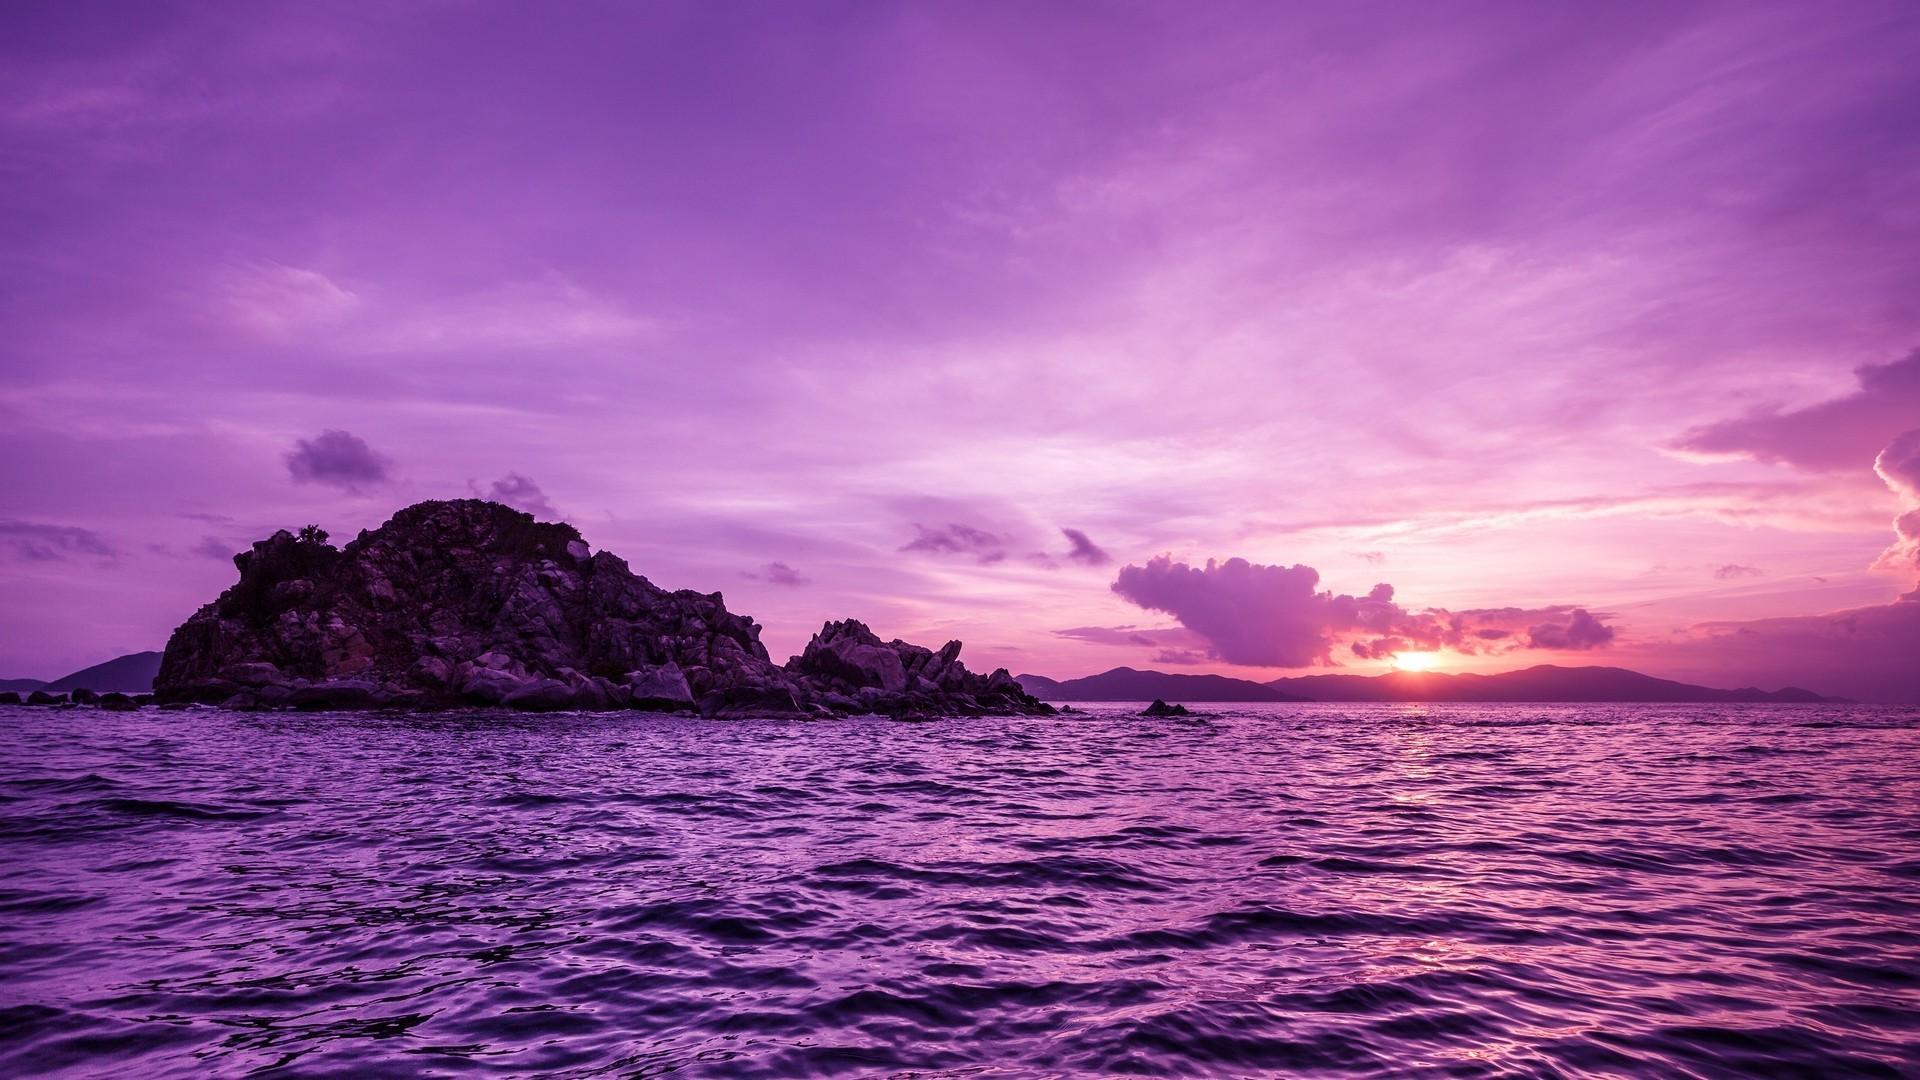 Purple Nature Wallpaper (44+ images)